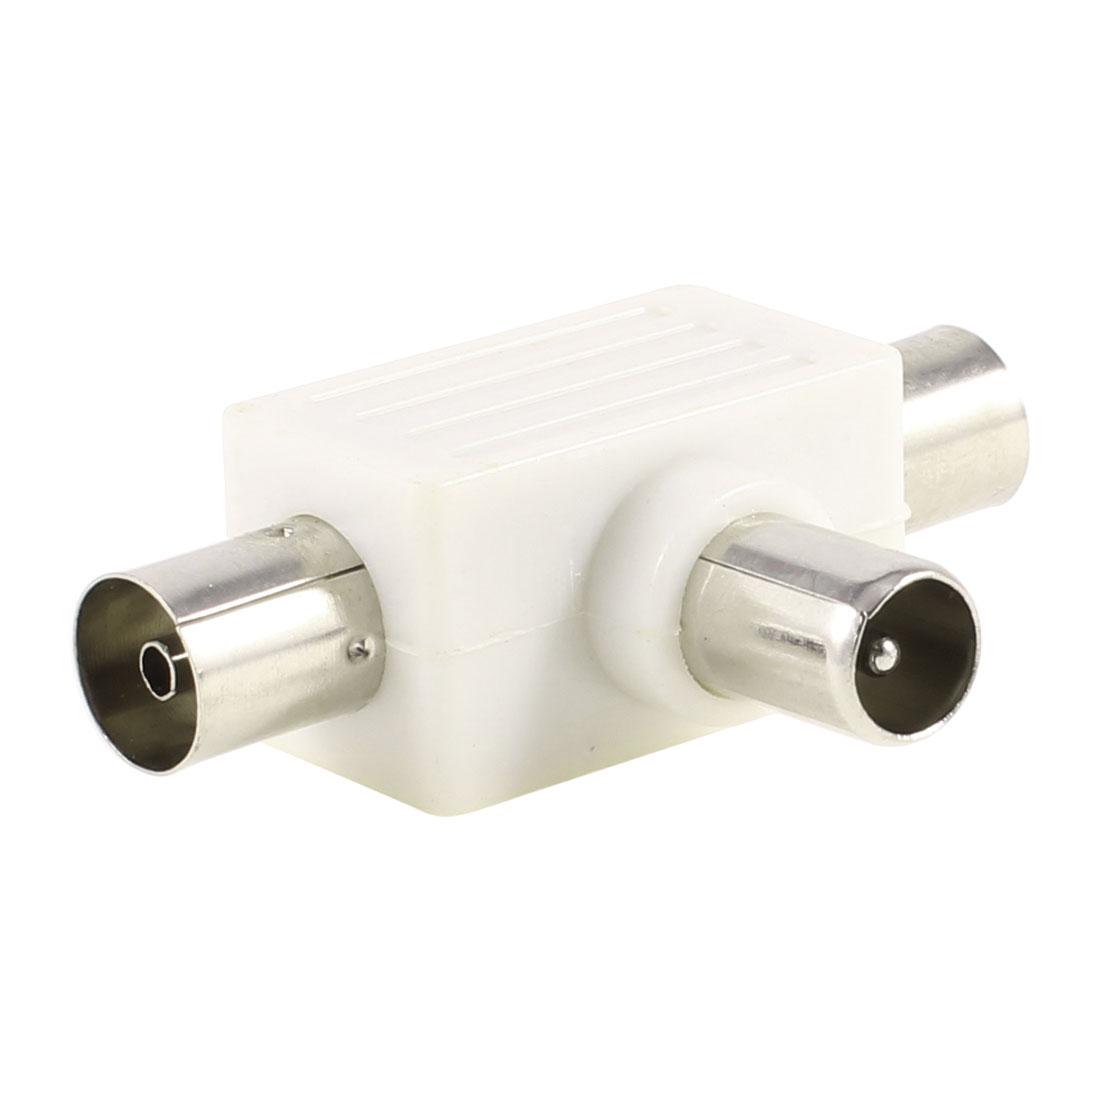 CCTV Camera BNC 3 Way Male to 2 Female Plug RF Coaxial Converter Connectors